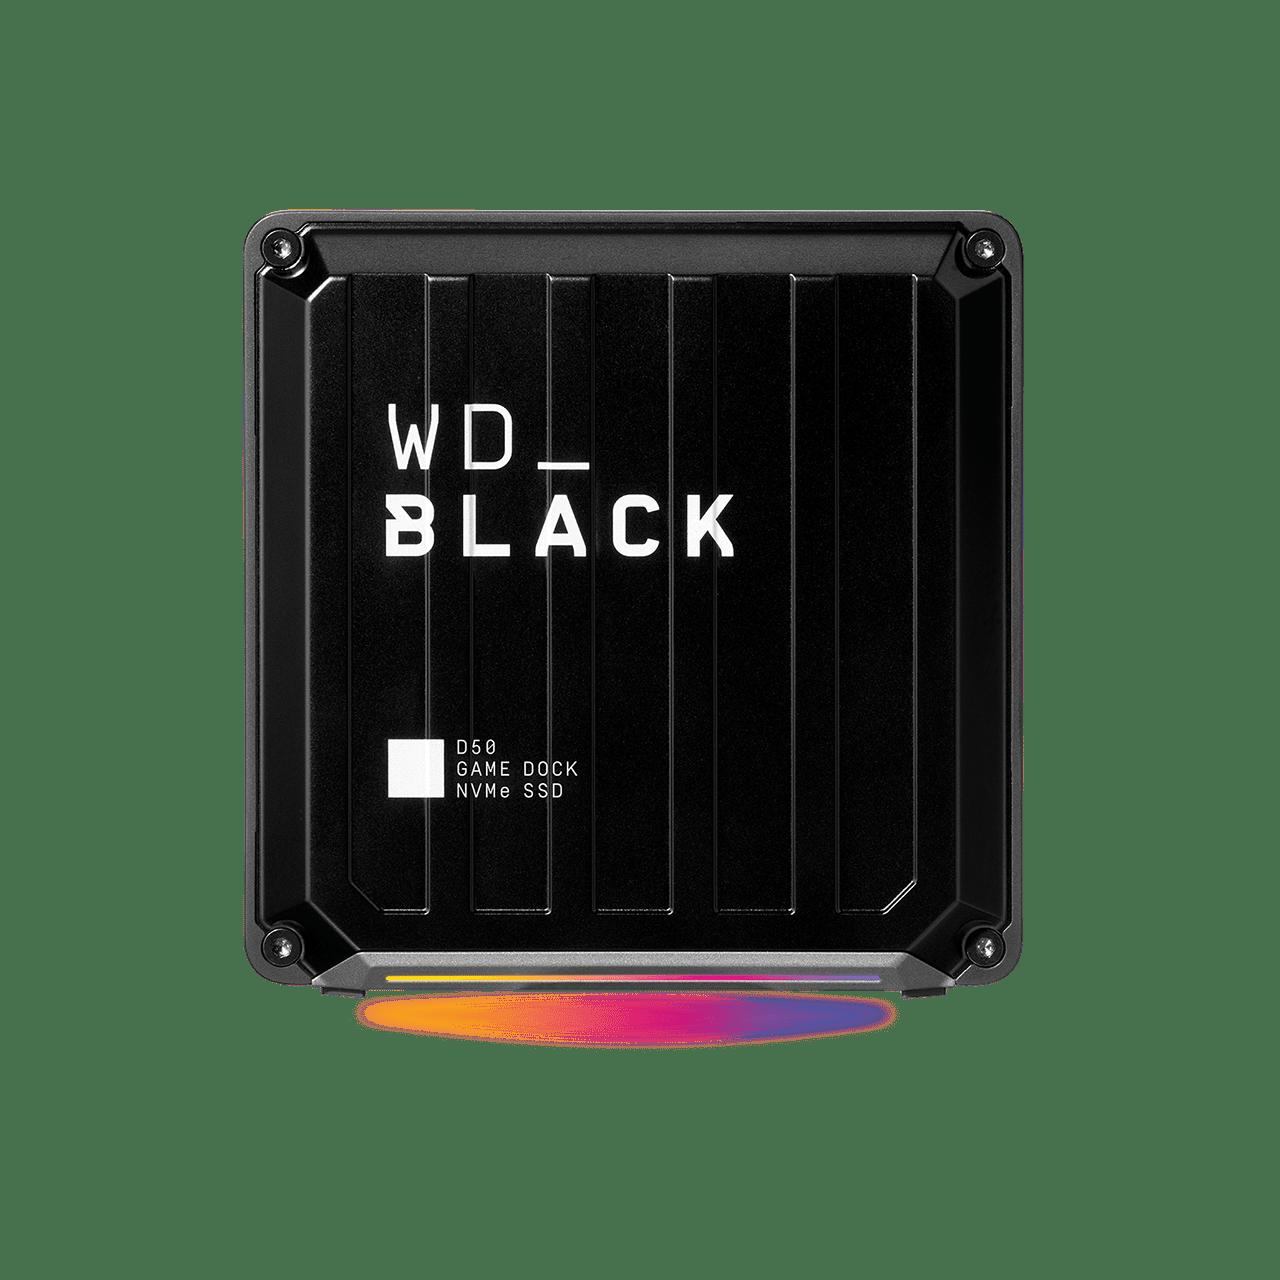 wd-black-d50